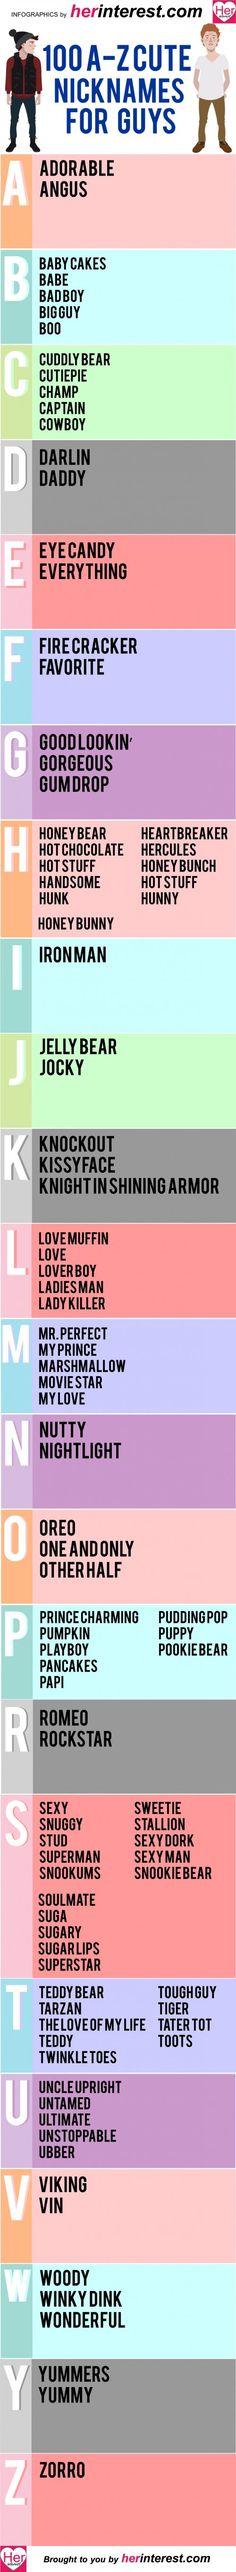 Cute Nicknames for Guys | herinterest.com